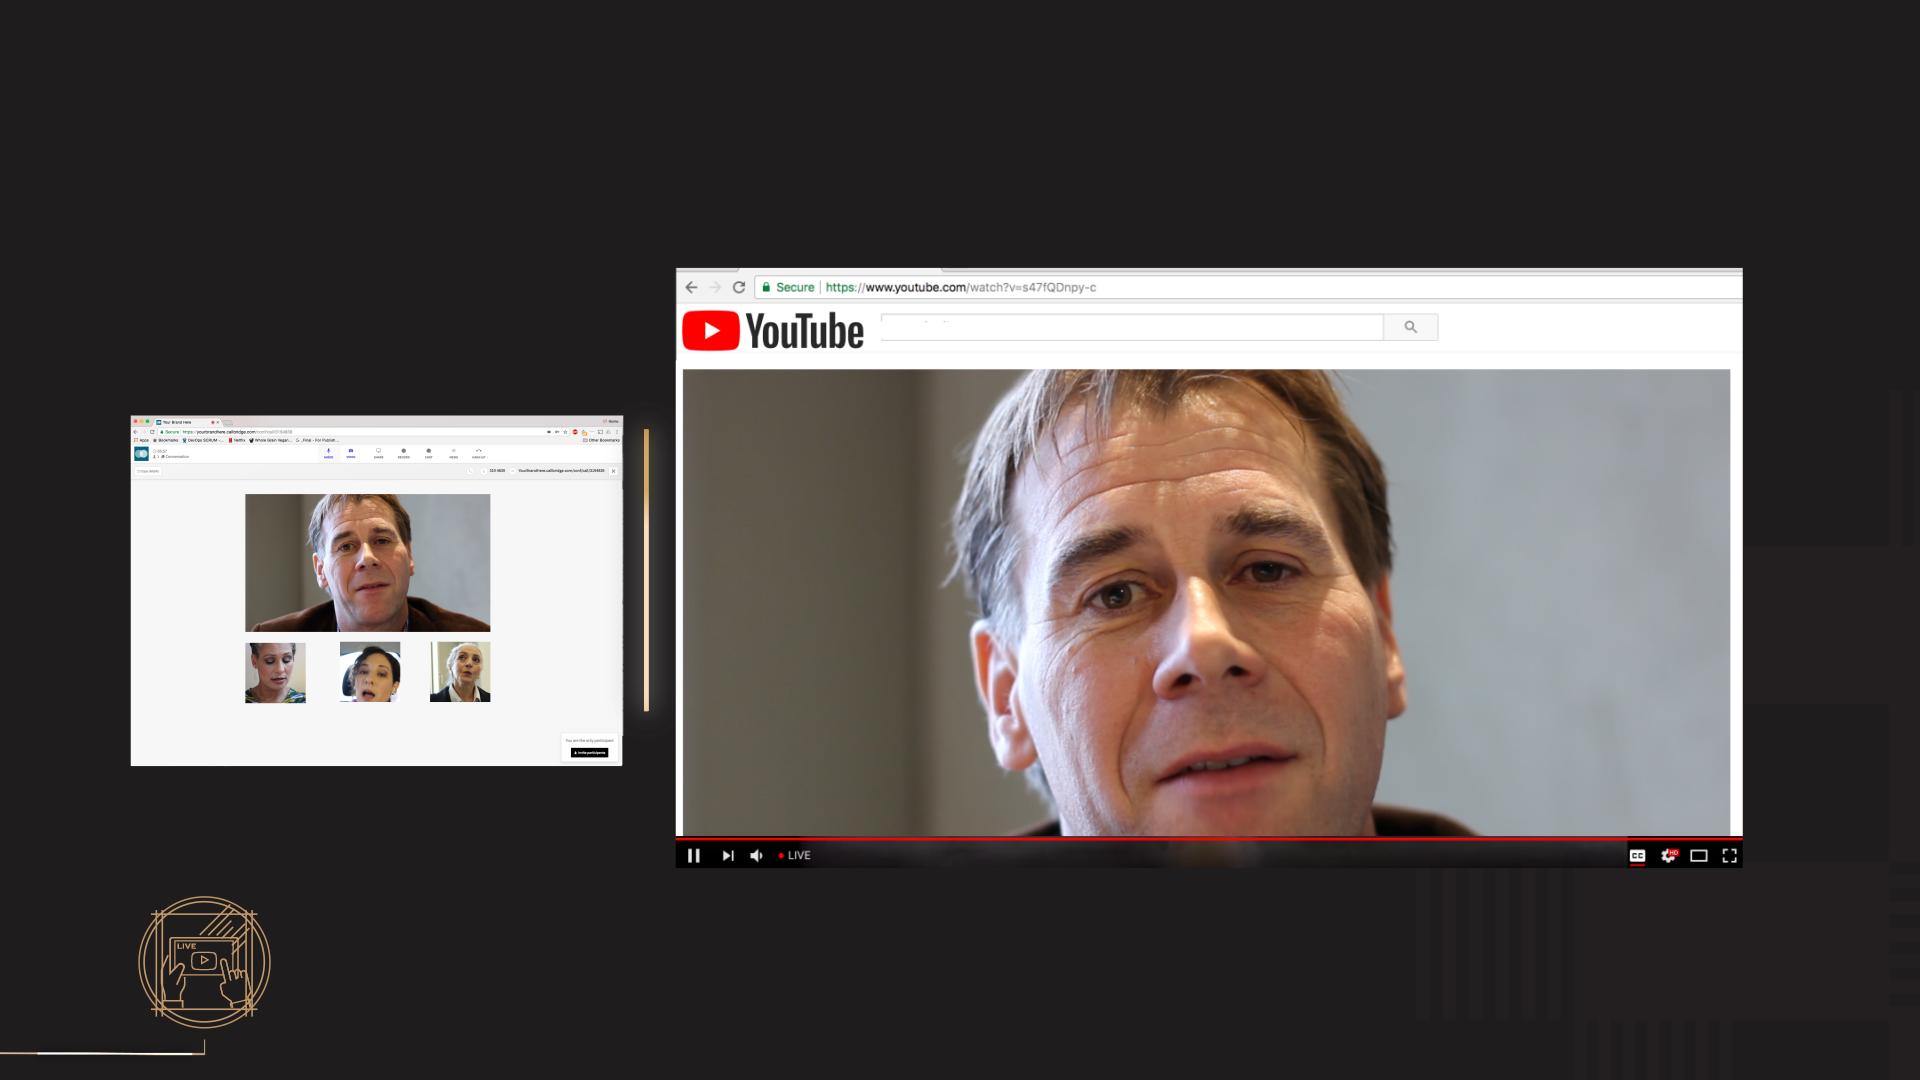 Callbridge Demo - Video Streaming to YouTube